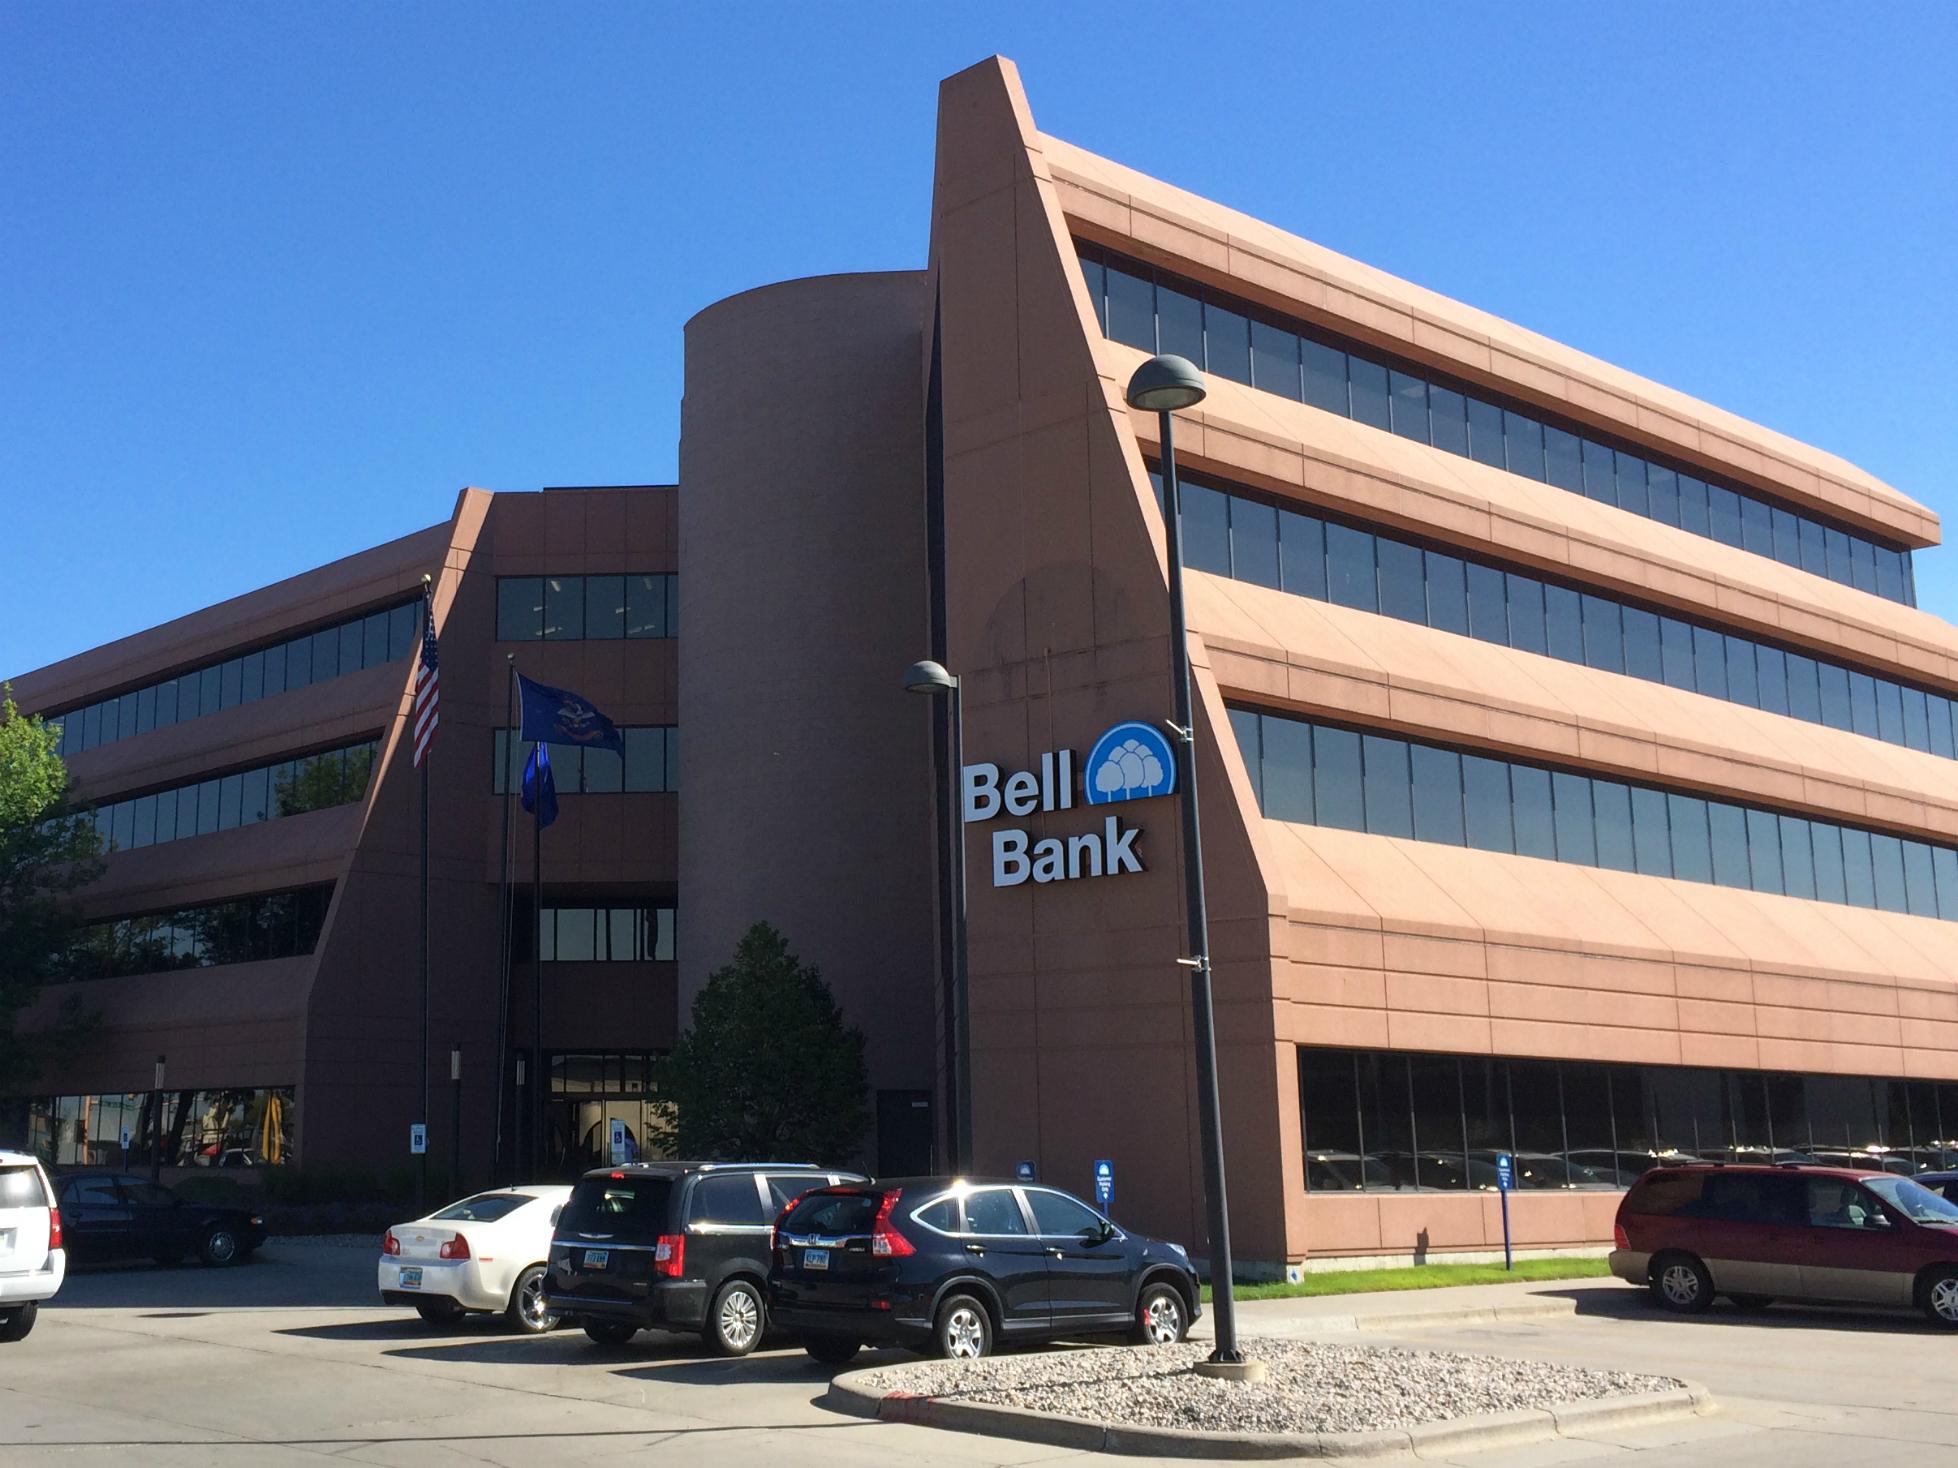 Bell Bank - Wikipedia